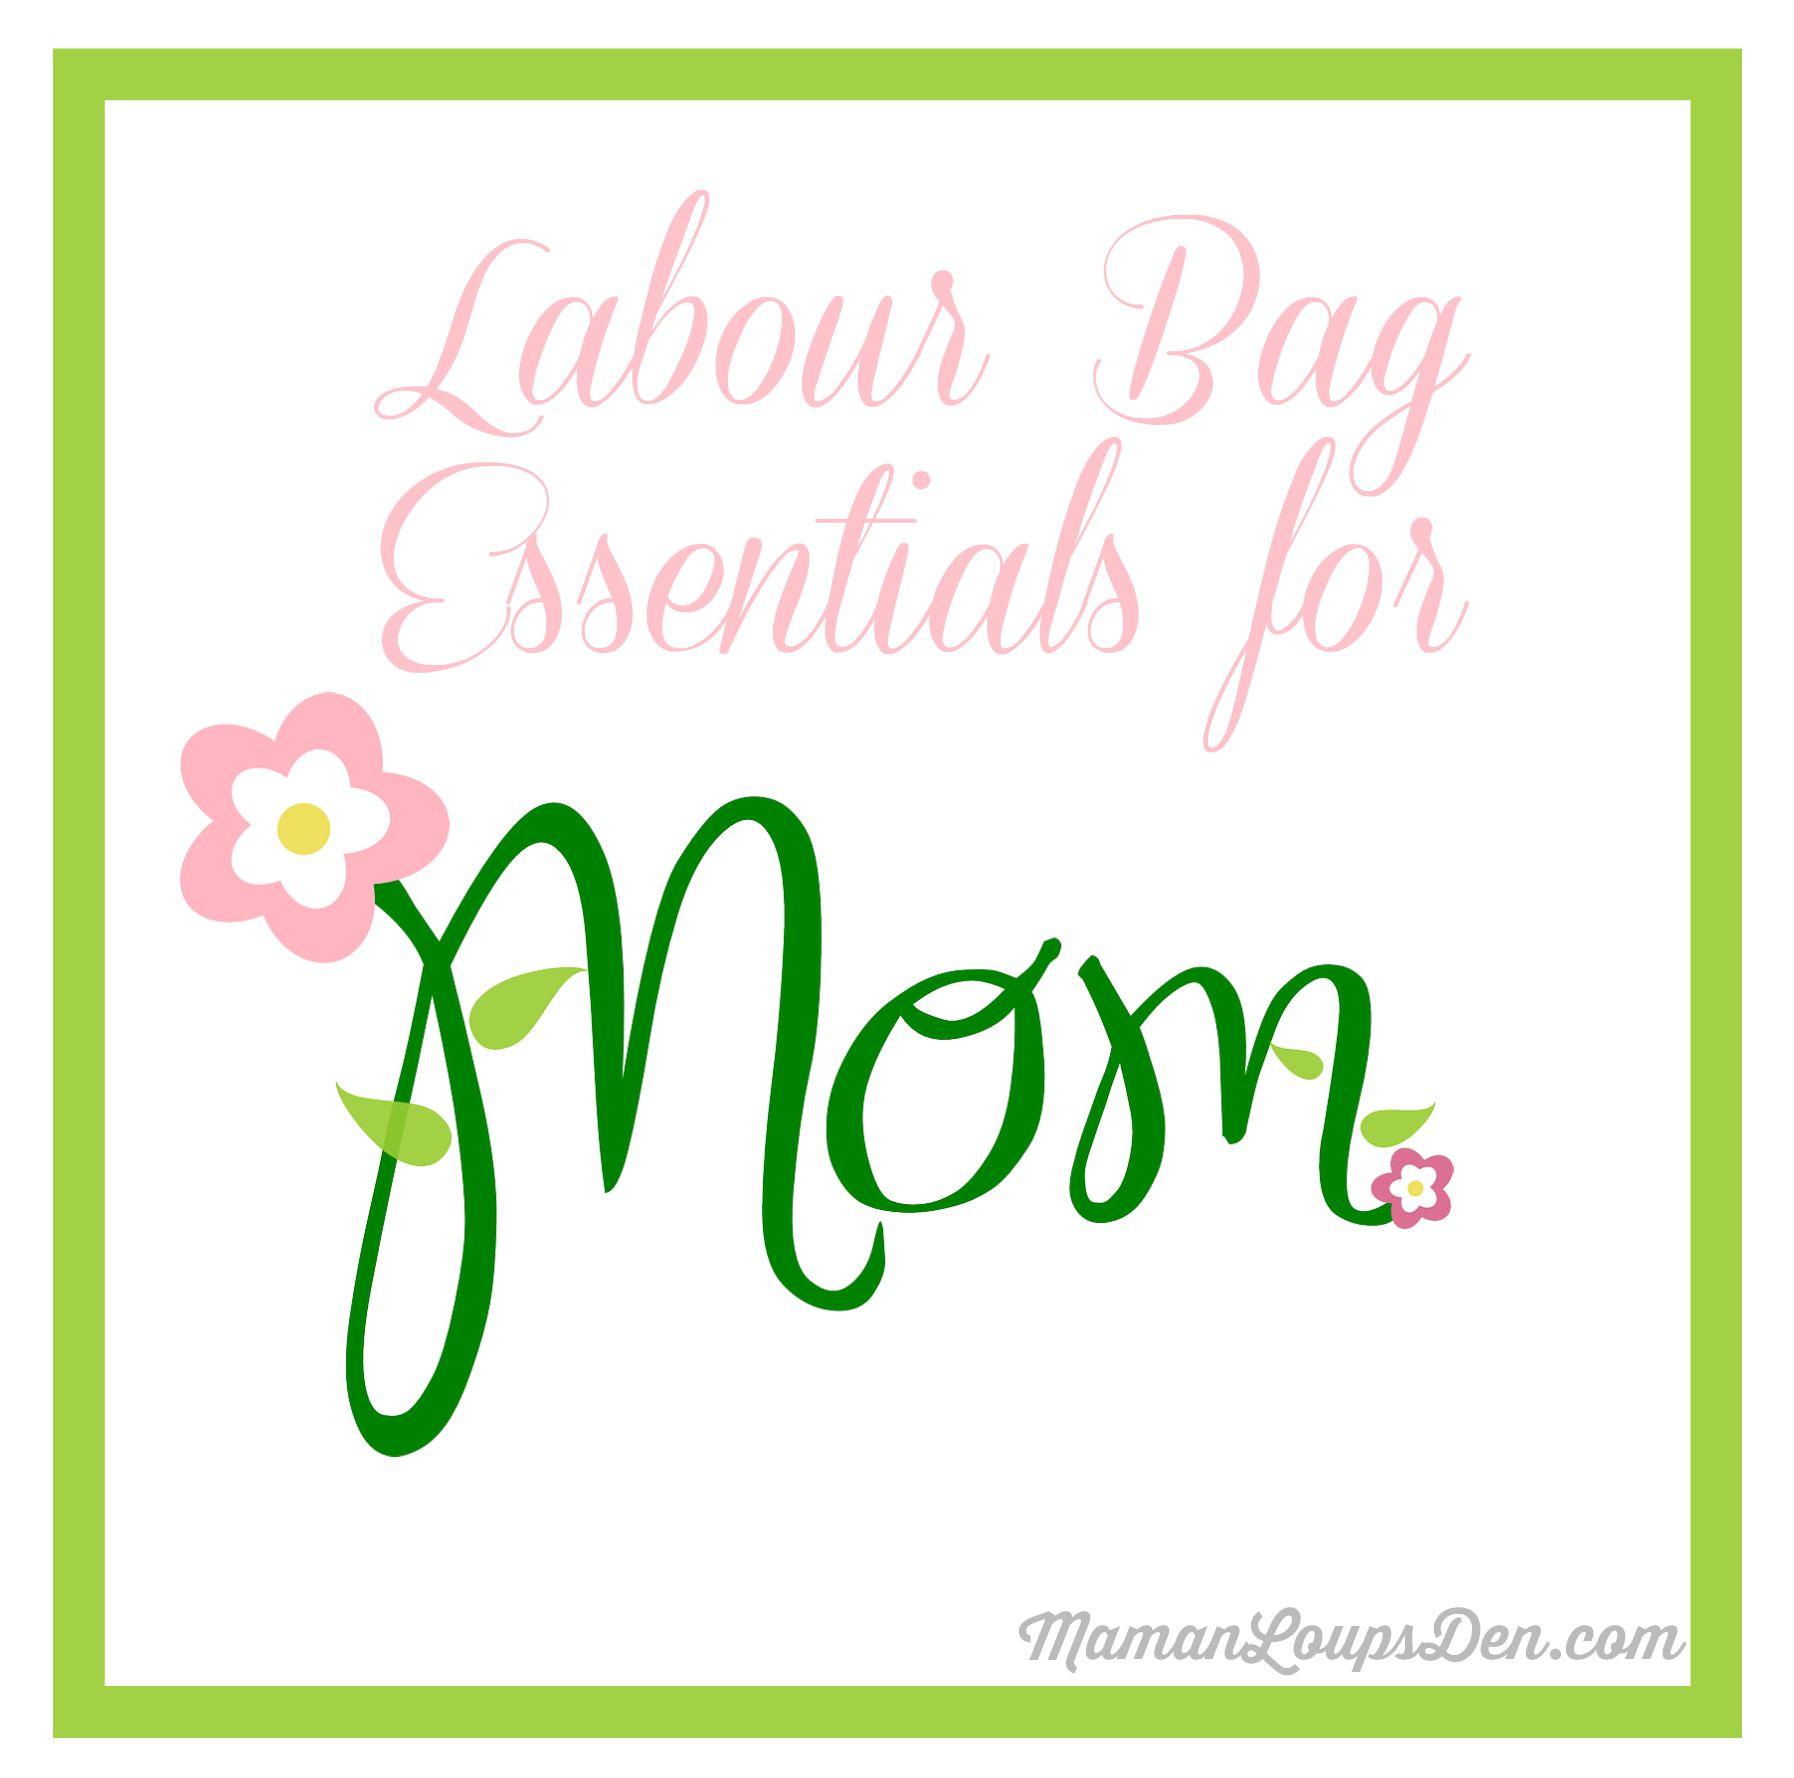 Labour Bag Essentials for Mom ~ Maman Loup's Den